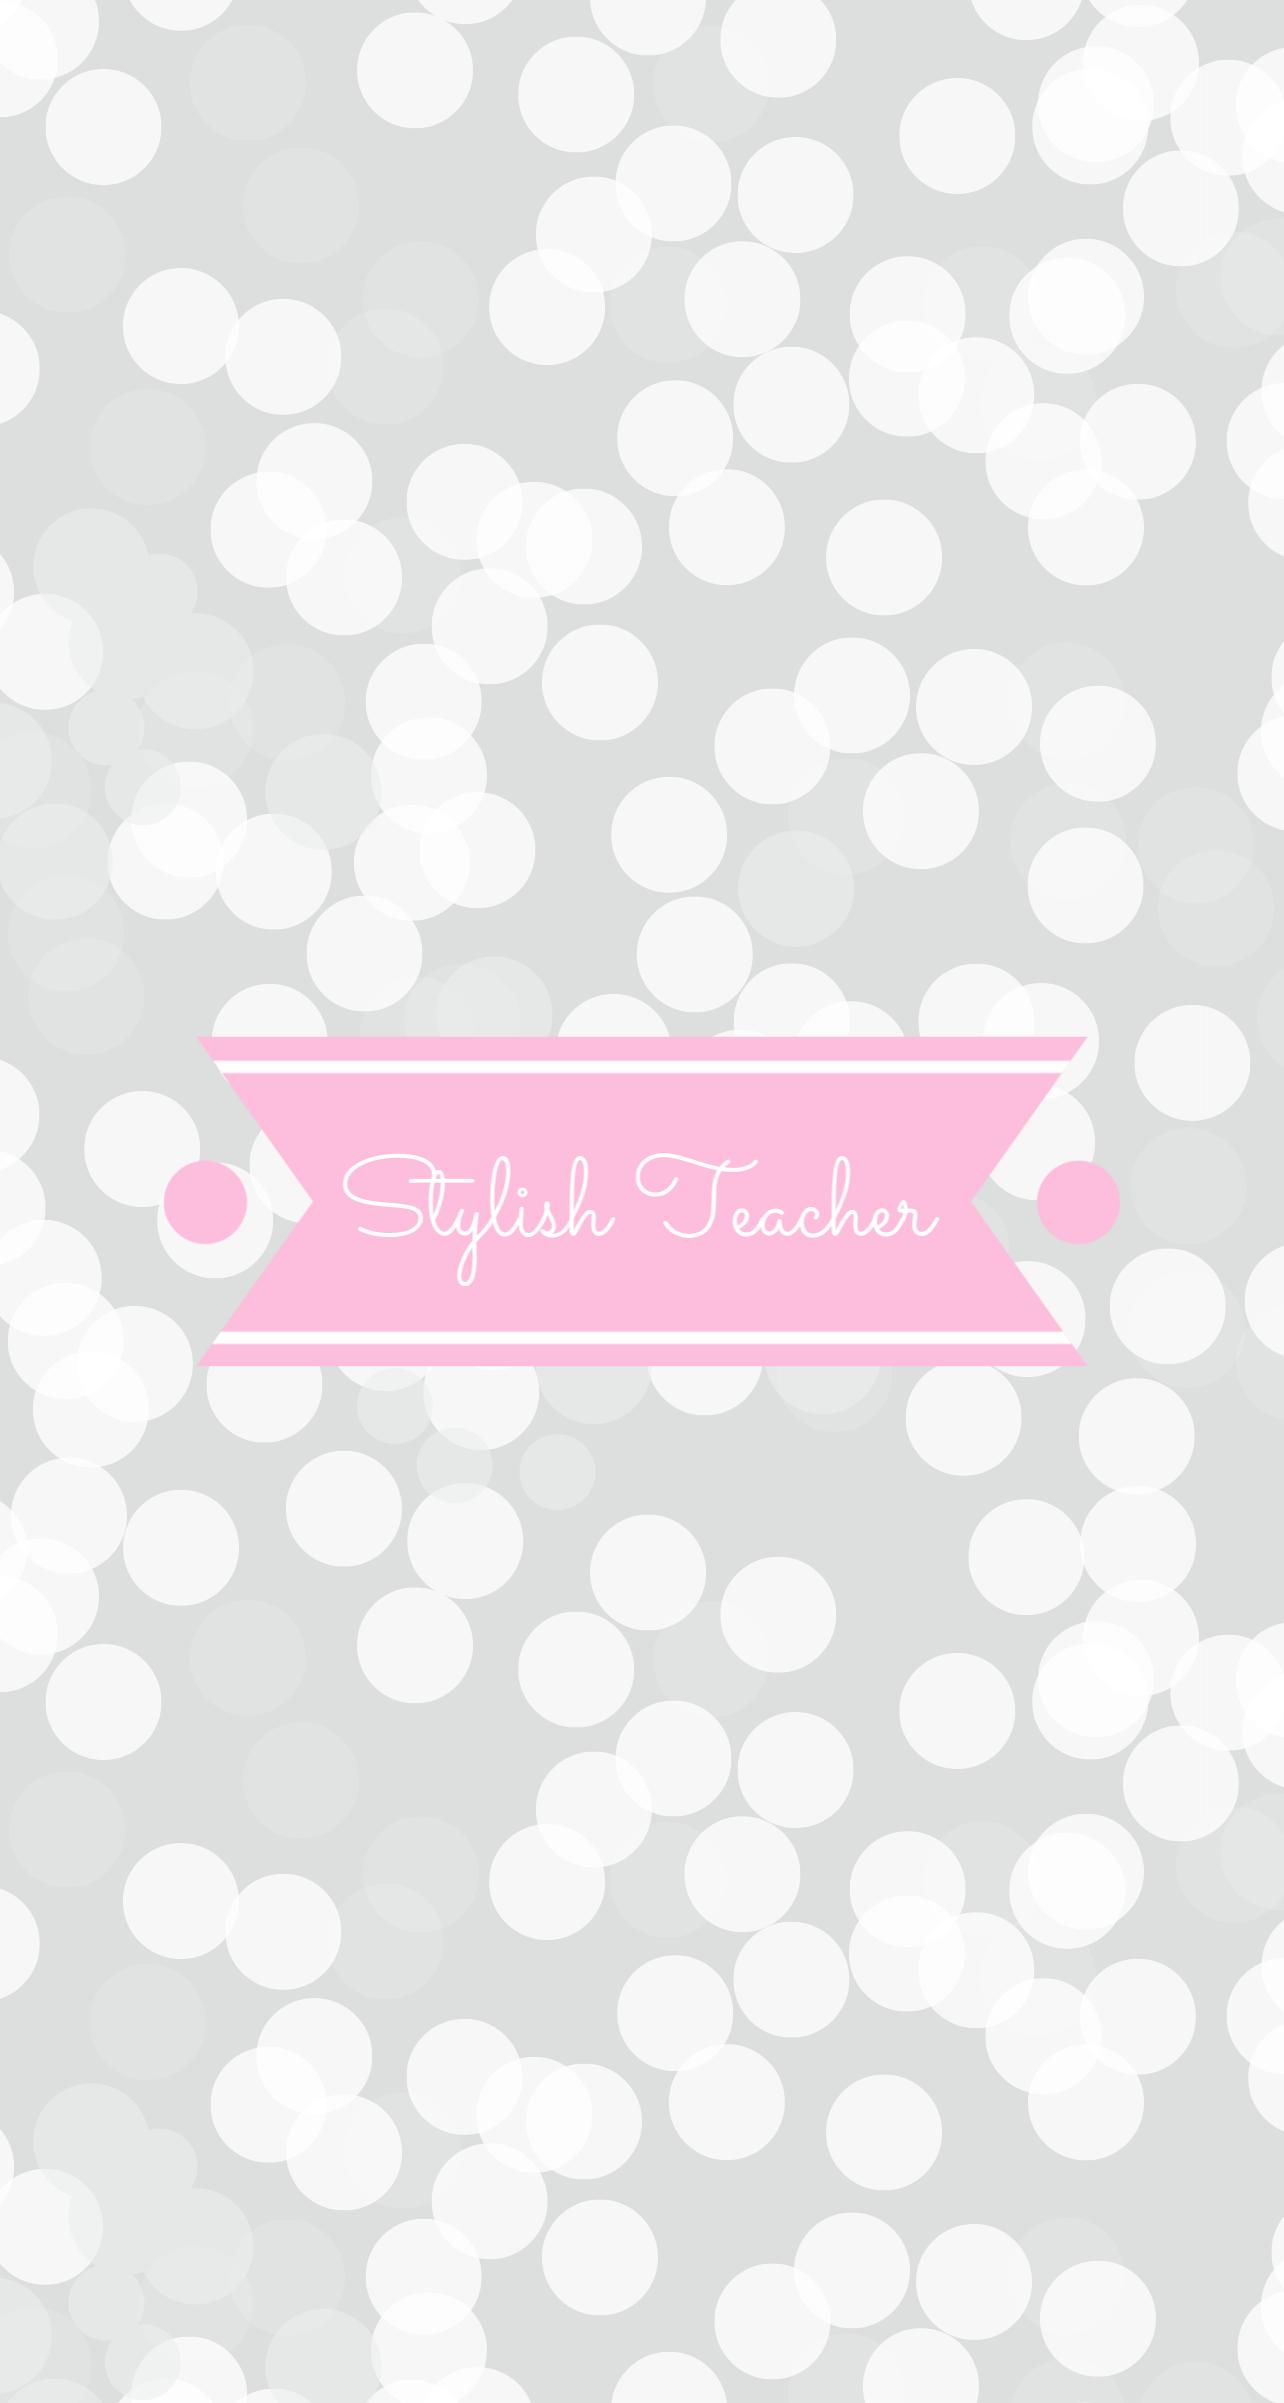 stylish teacher   fashion, luxe, beauty, lifestyle